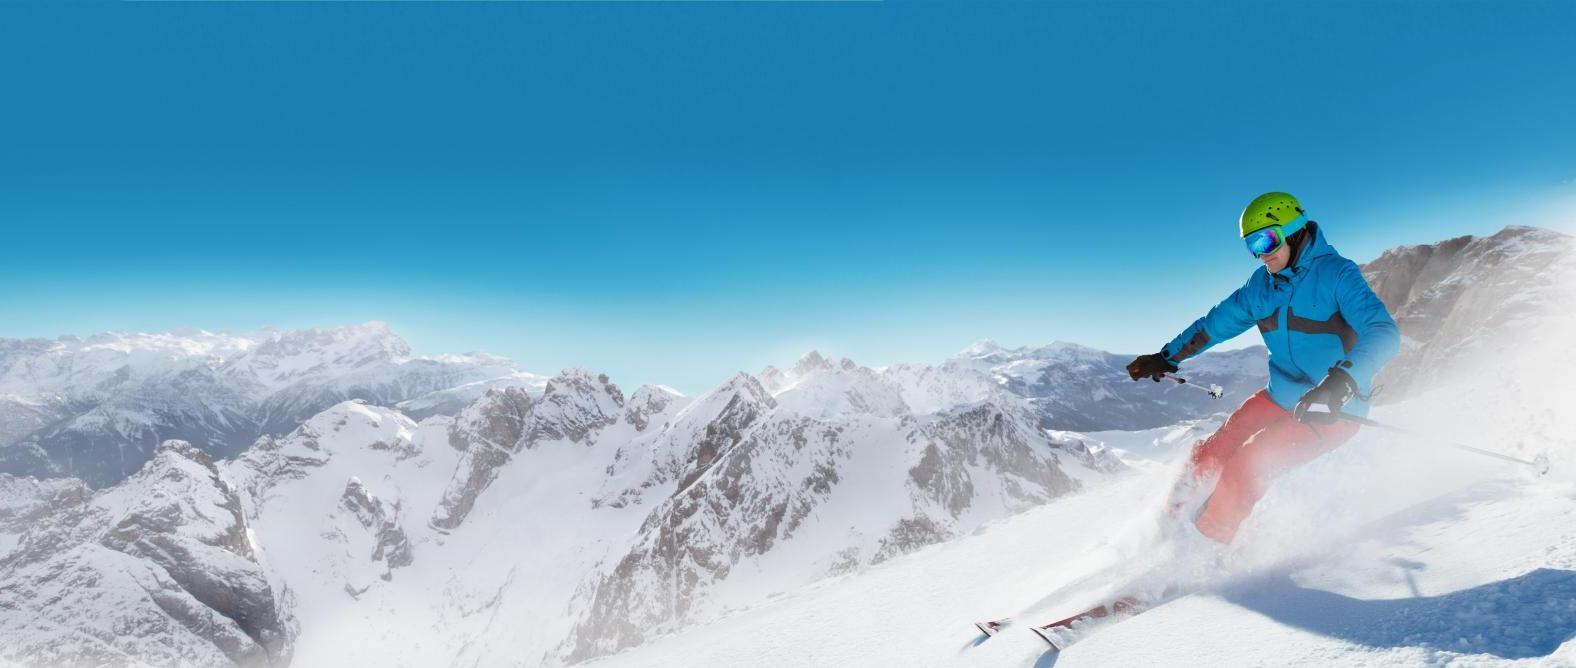 Man skier running downhill on sunny alpine slope in Beaver Creek